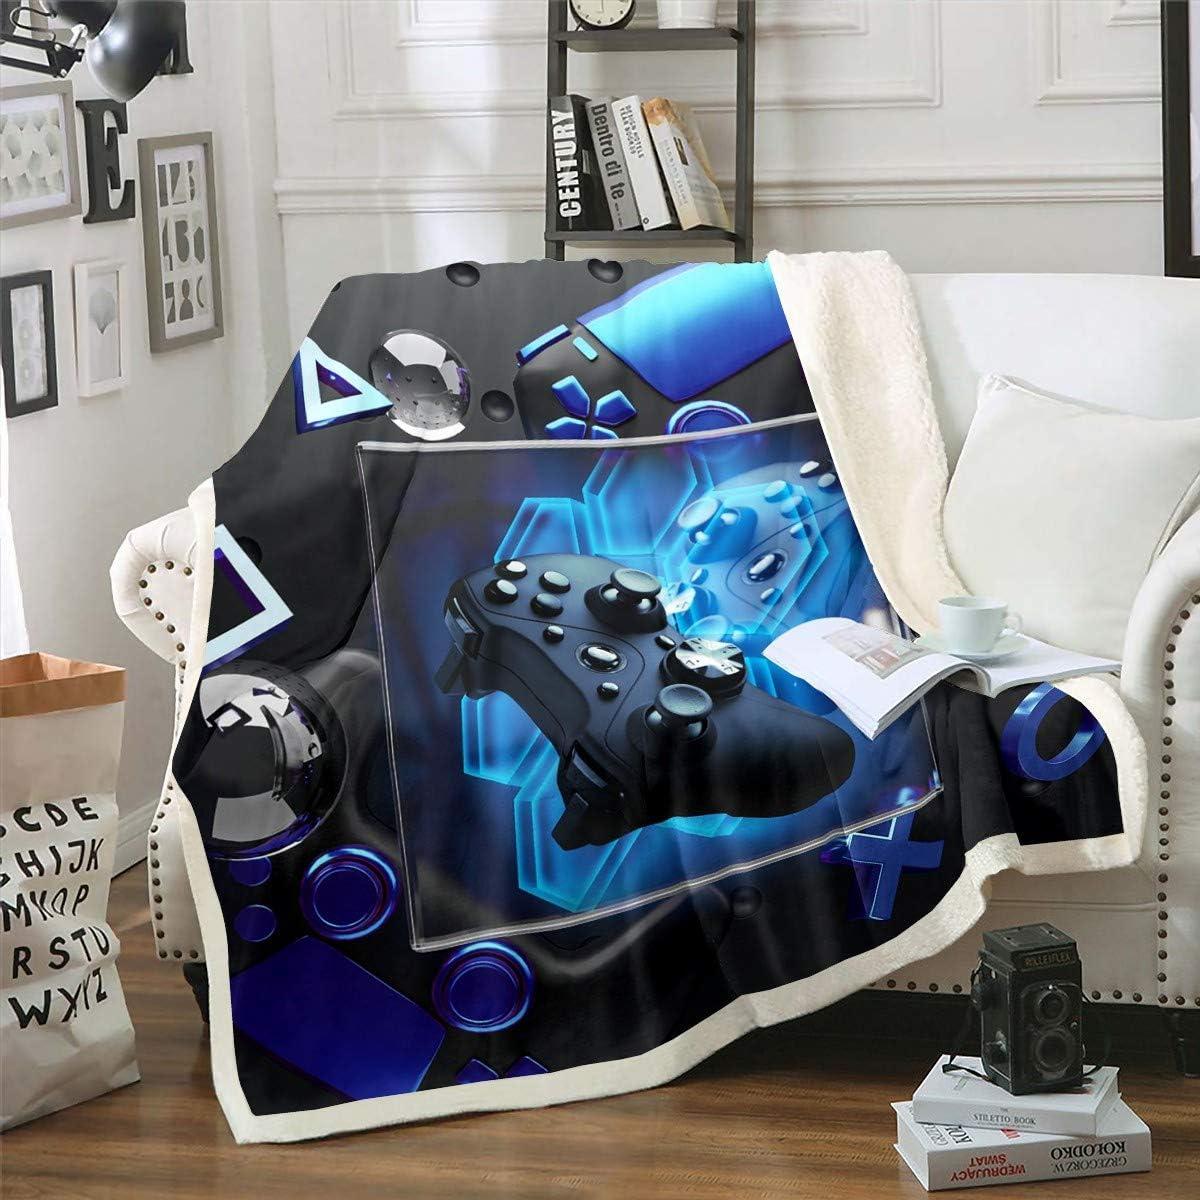 Erosebridal Boys Gaming Bed Blanket Modern Gamer Gamepad Plush Blanket,Video Game Throw Soft Couch Throw Blanket Pink Blue Action Buttons Fleece Blankets,Gift Blanket,Black Queen 90x90